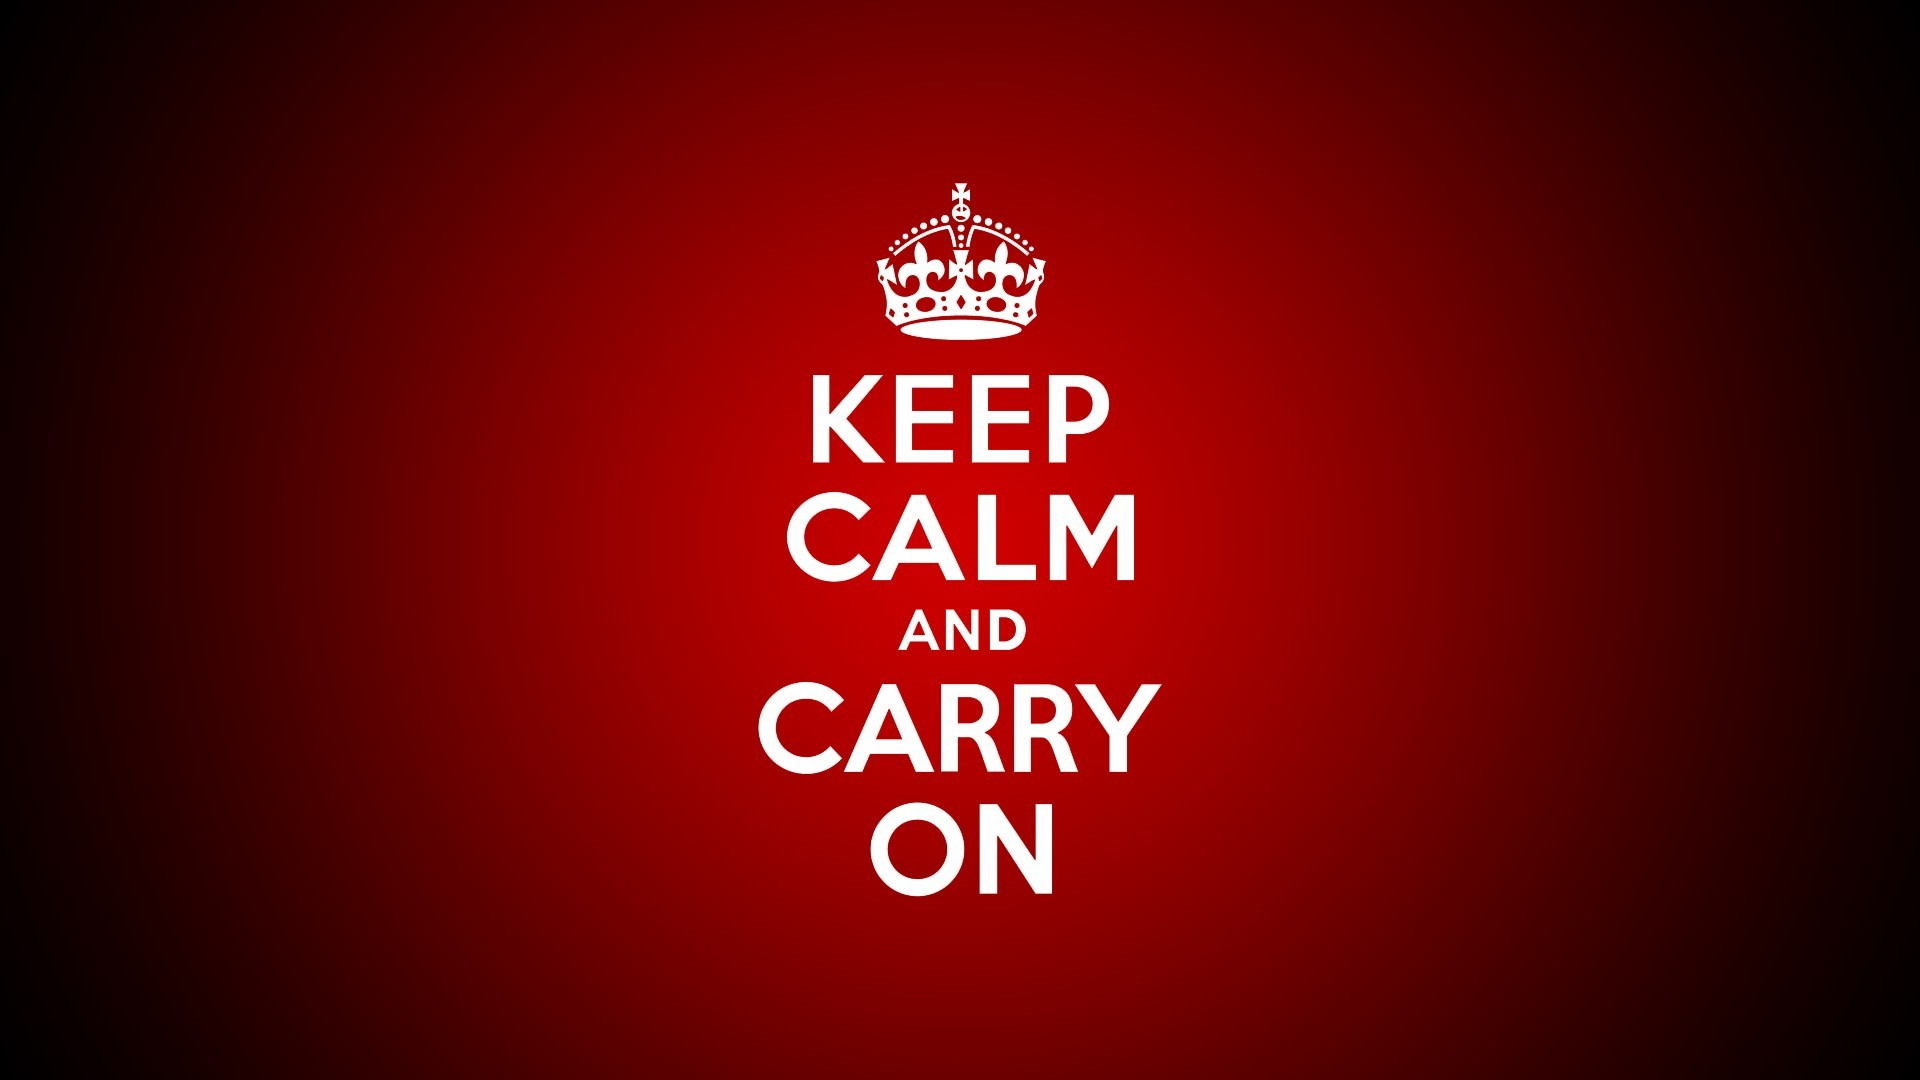 Keep Calm Quotes Wallpaper